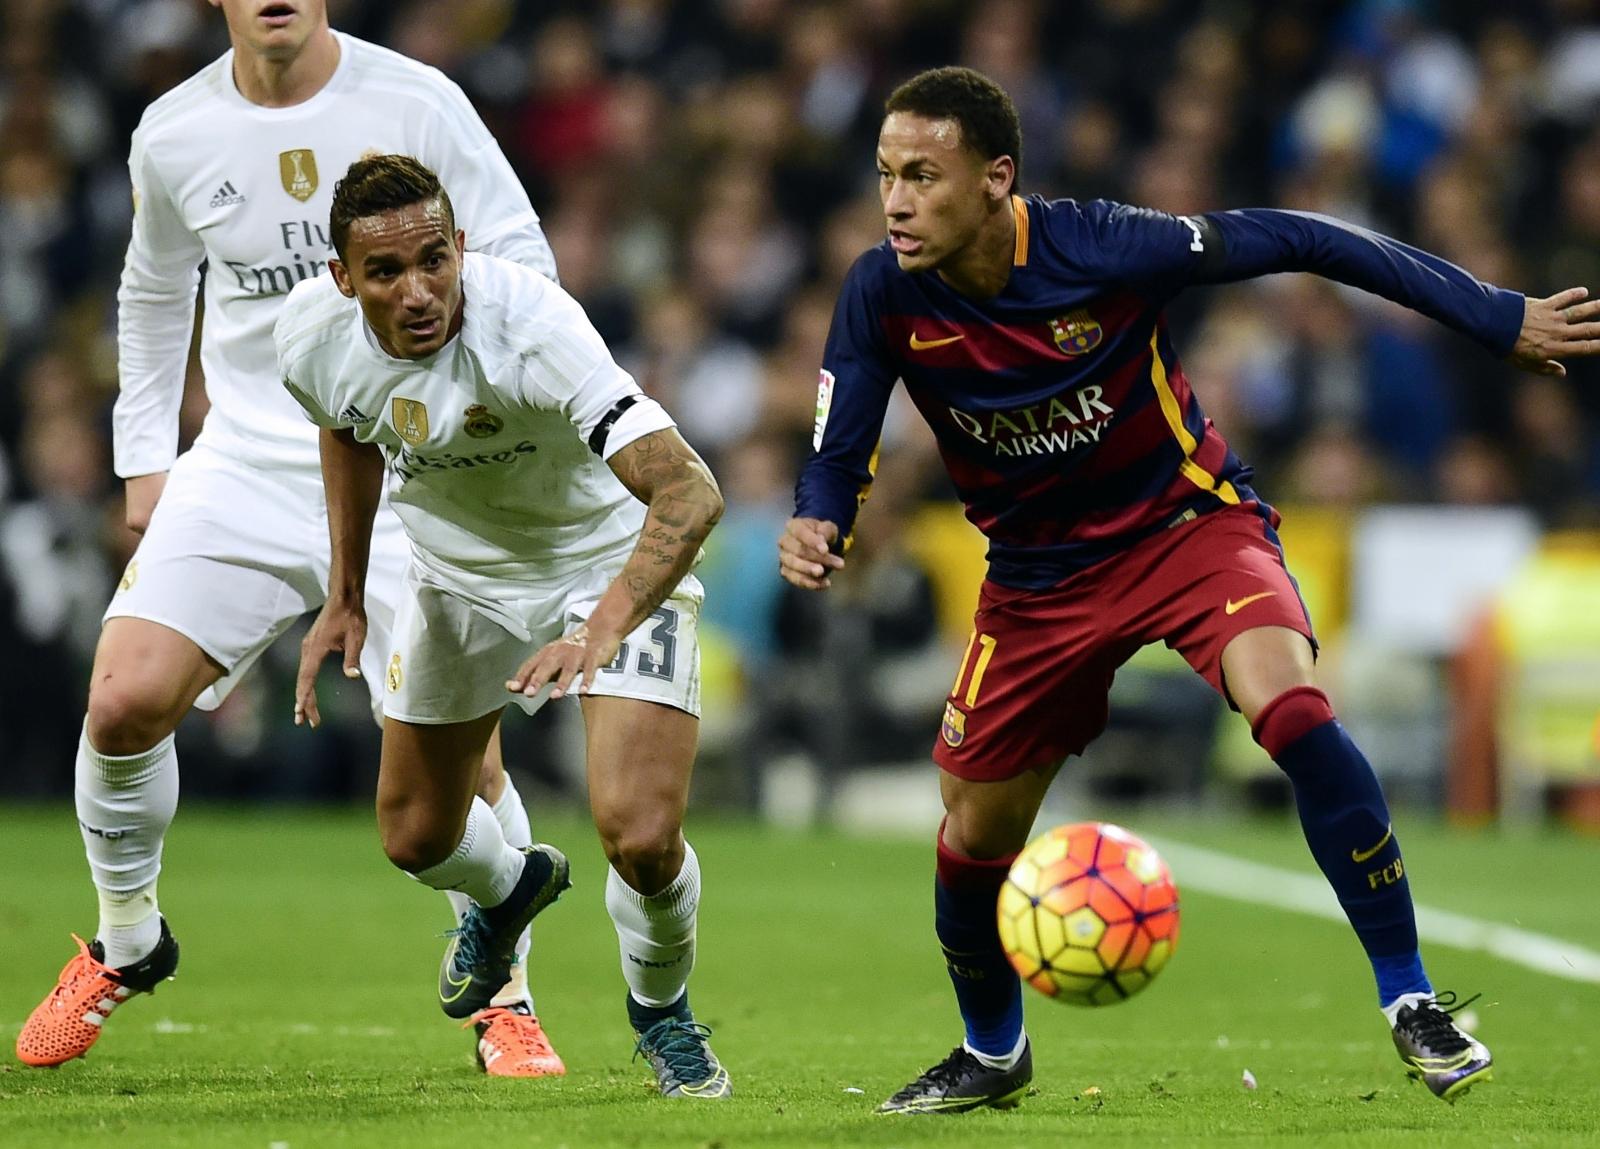 Danilo and Neymar